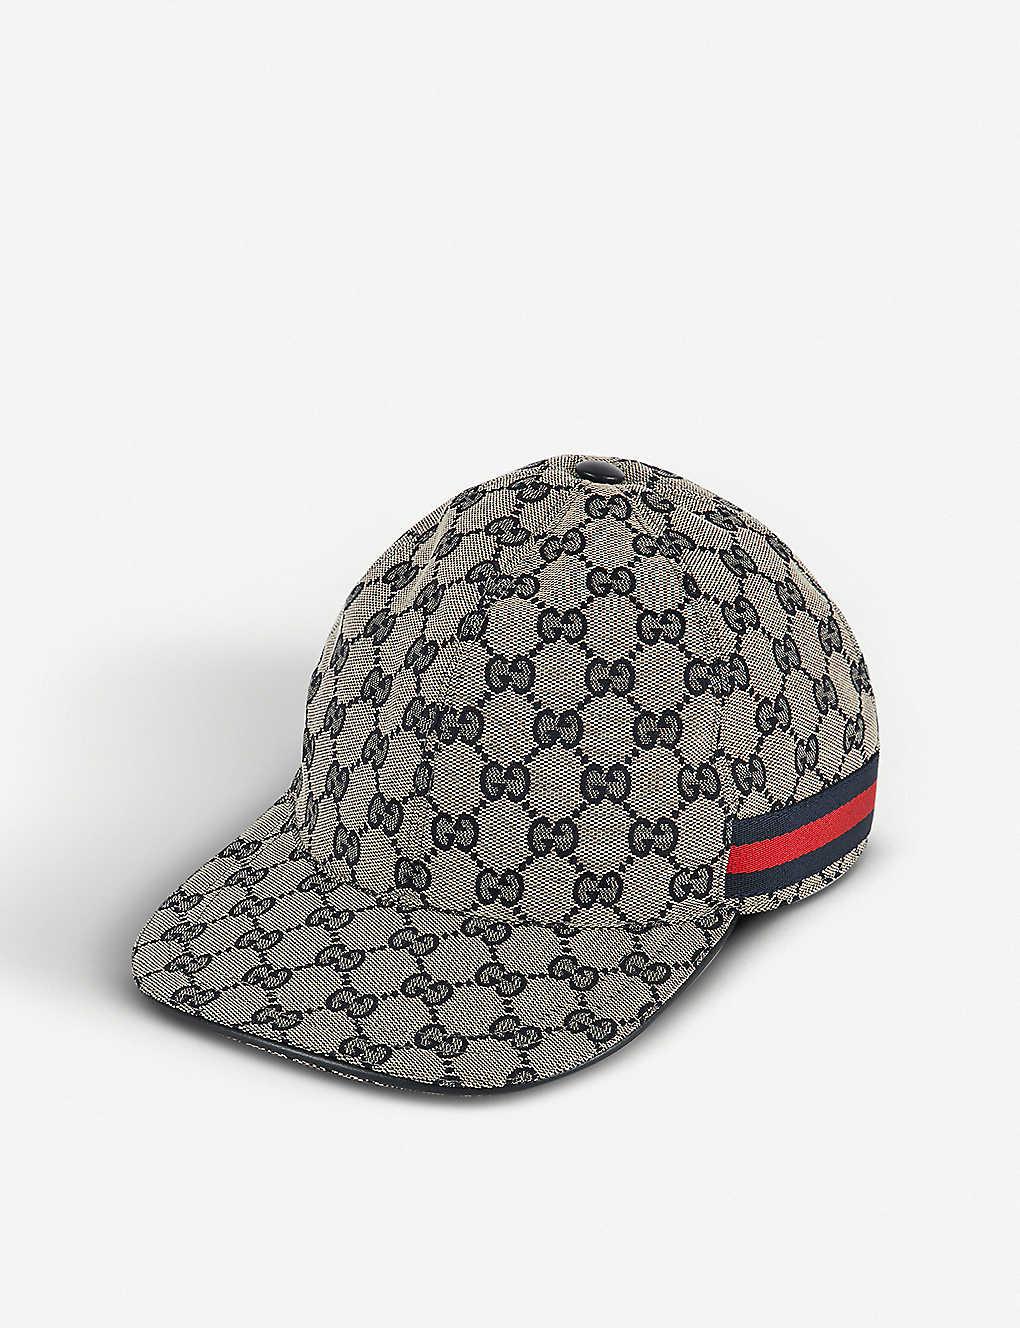 6a9219f737a GUCCI - GG Web stripe baseball cap